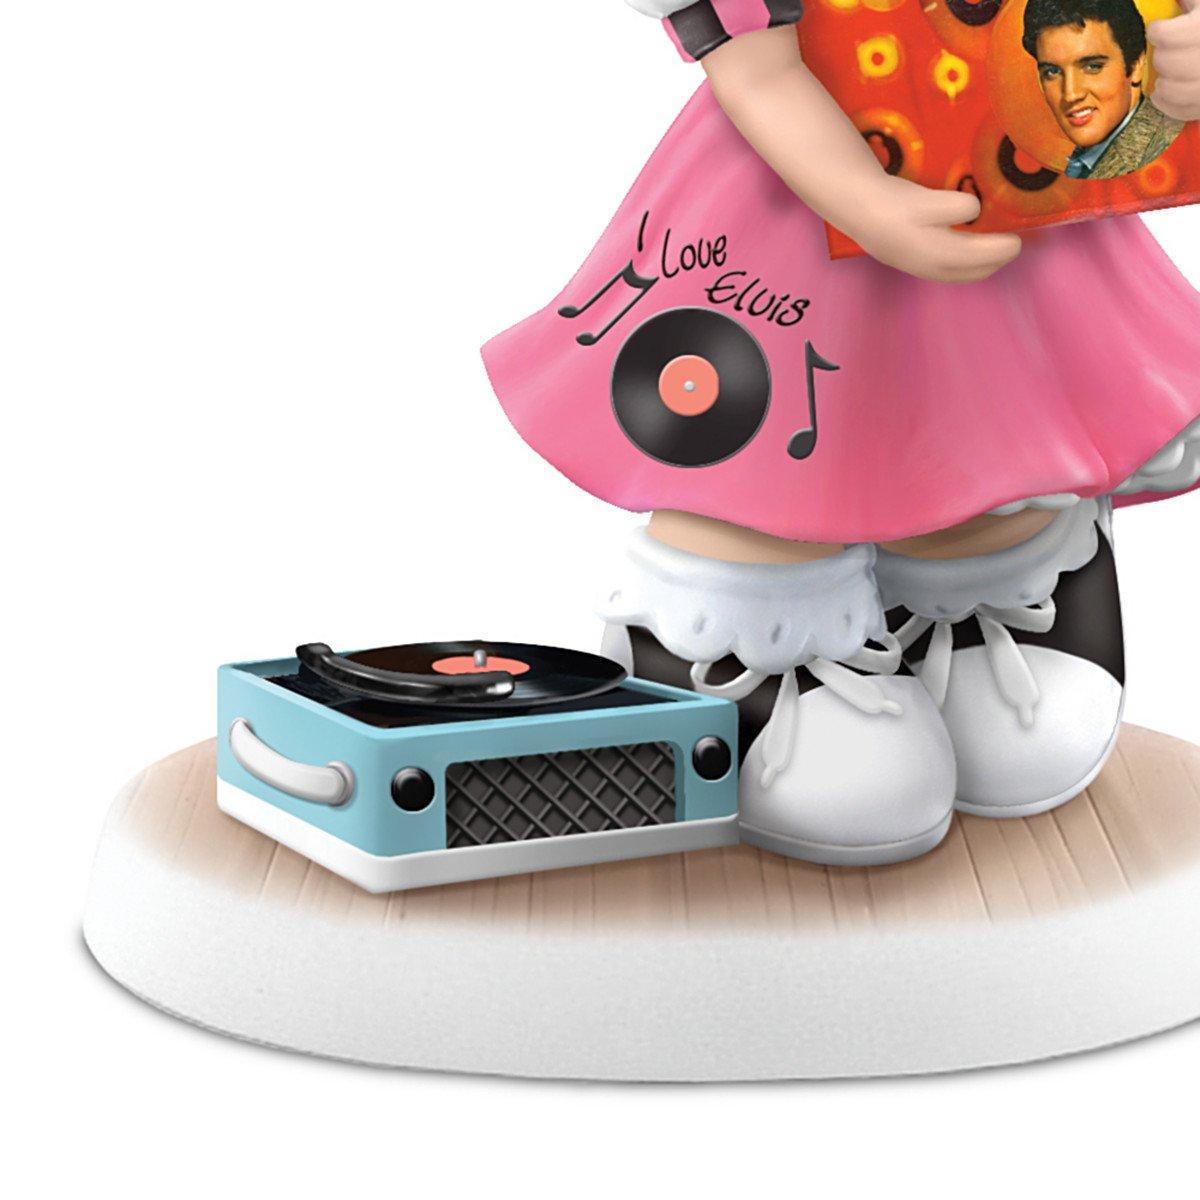 The Hamilton Collection Precious Moments I ll Never Let You Go Elvis Fan Figurine Shows Elvis Album Art